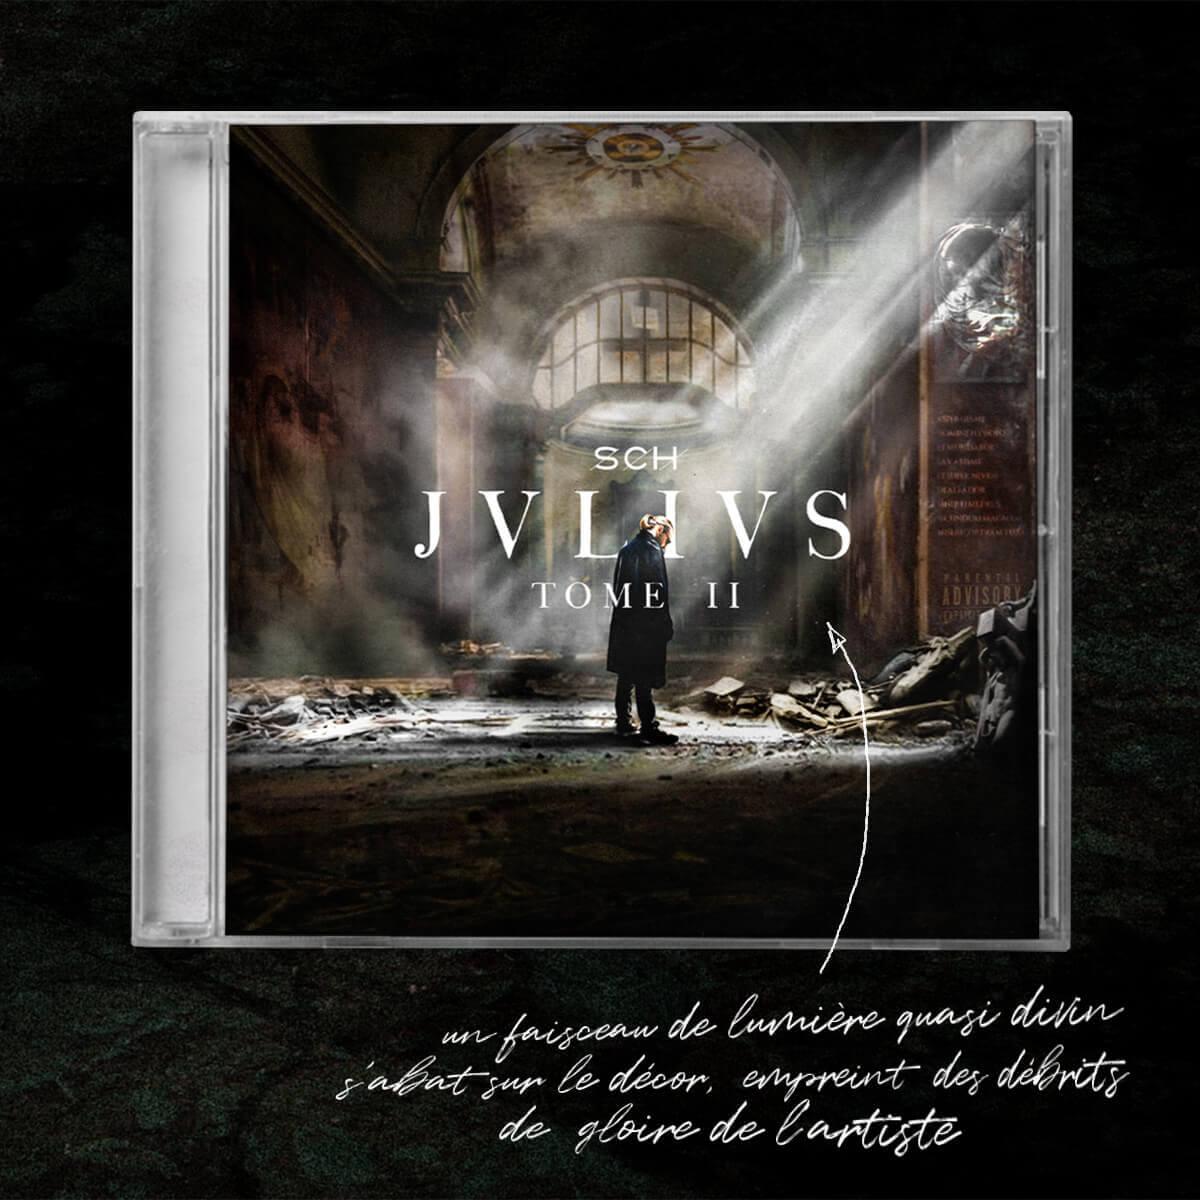 sch-nouvel-album-jvlivs-tome2